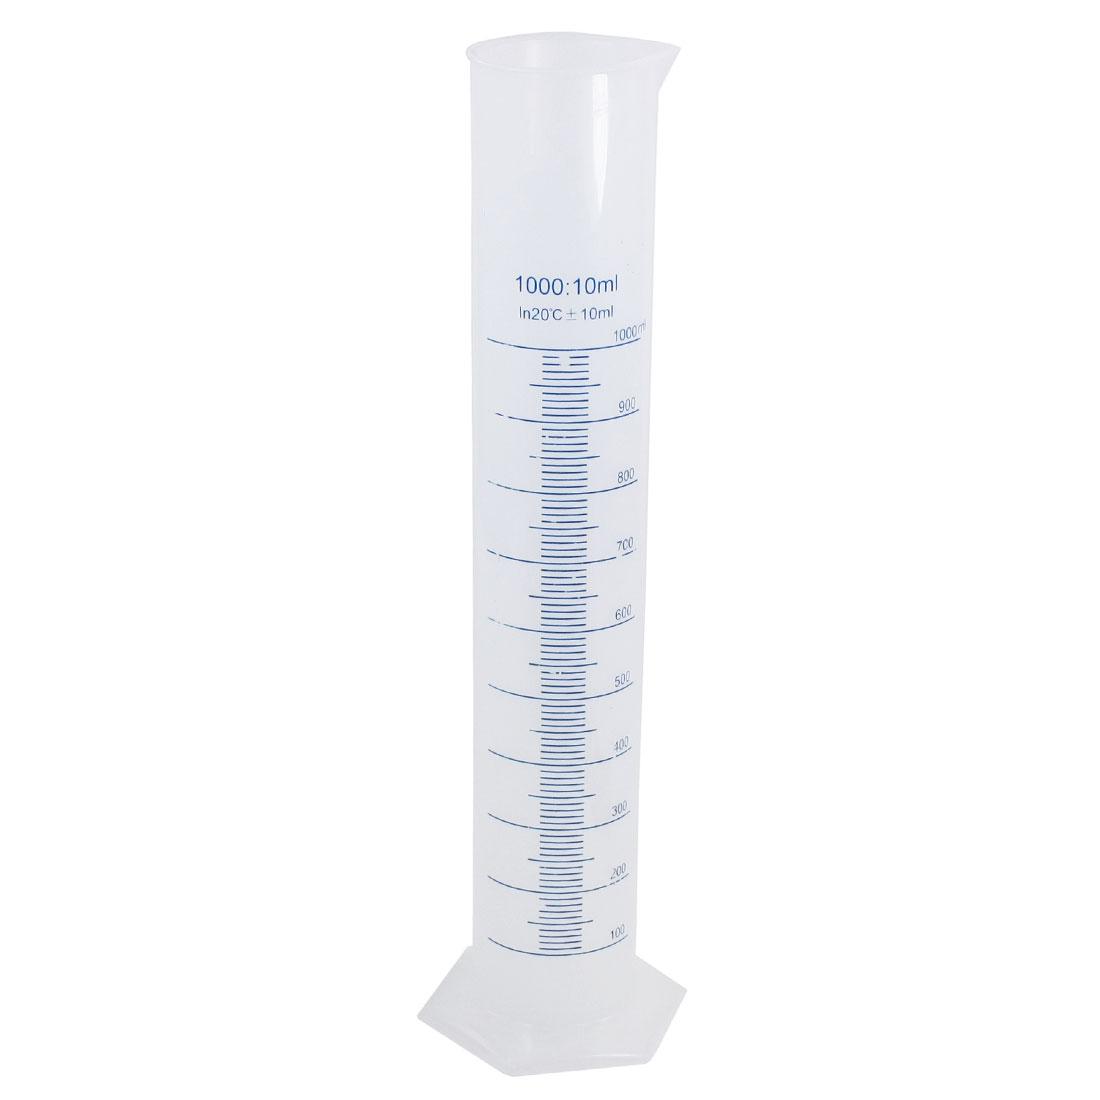 Lab Laboratory Test 41cm Height 1000ml Transparent Plastic Graduated Cylinder Measuring Cup 10ml Tolerance